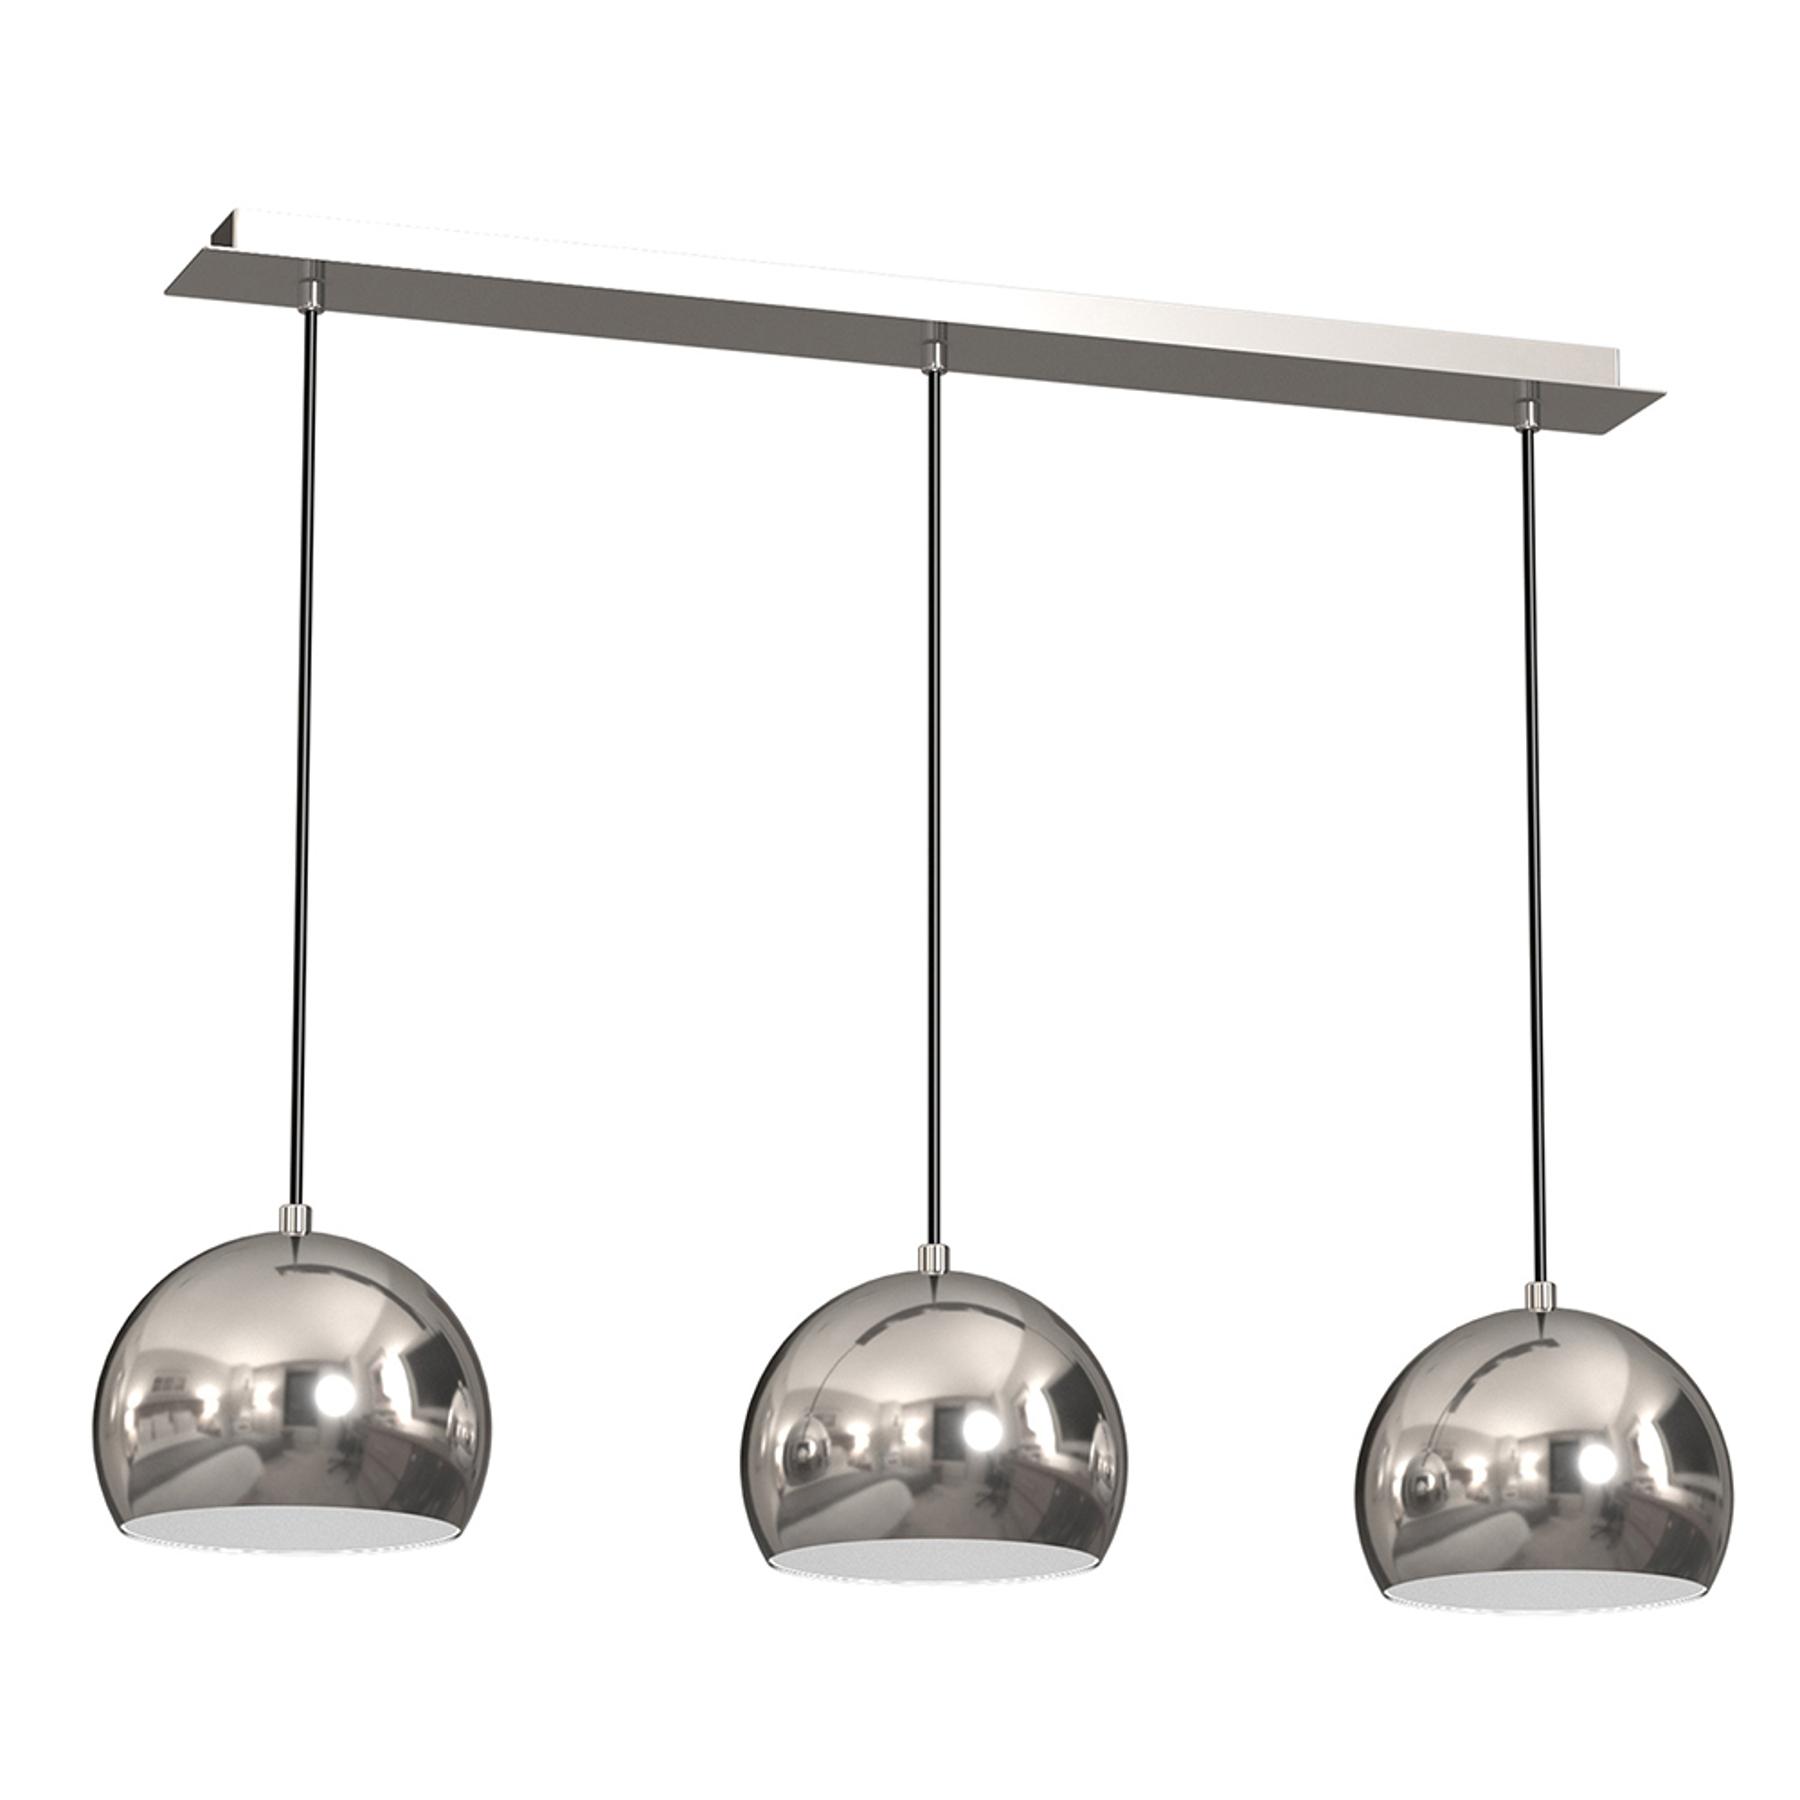 Lampa wisząca Cool, 3-punktowa liniowa, chrom